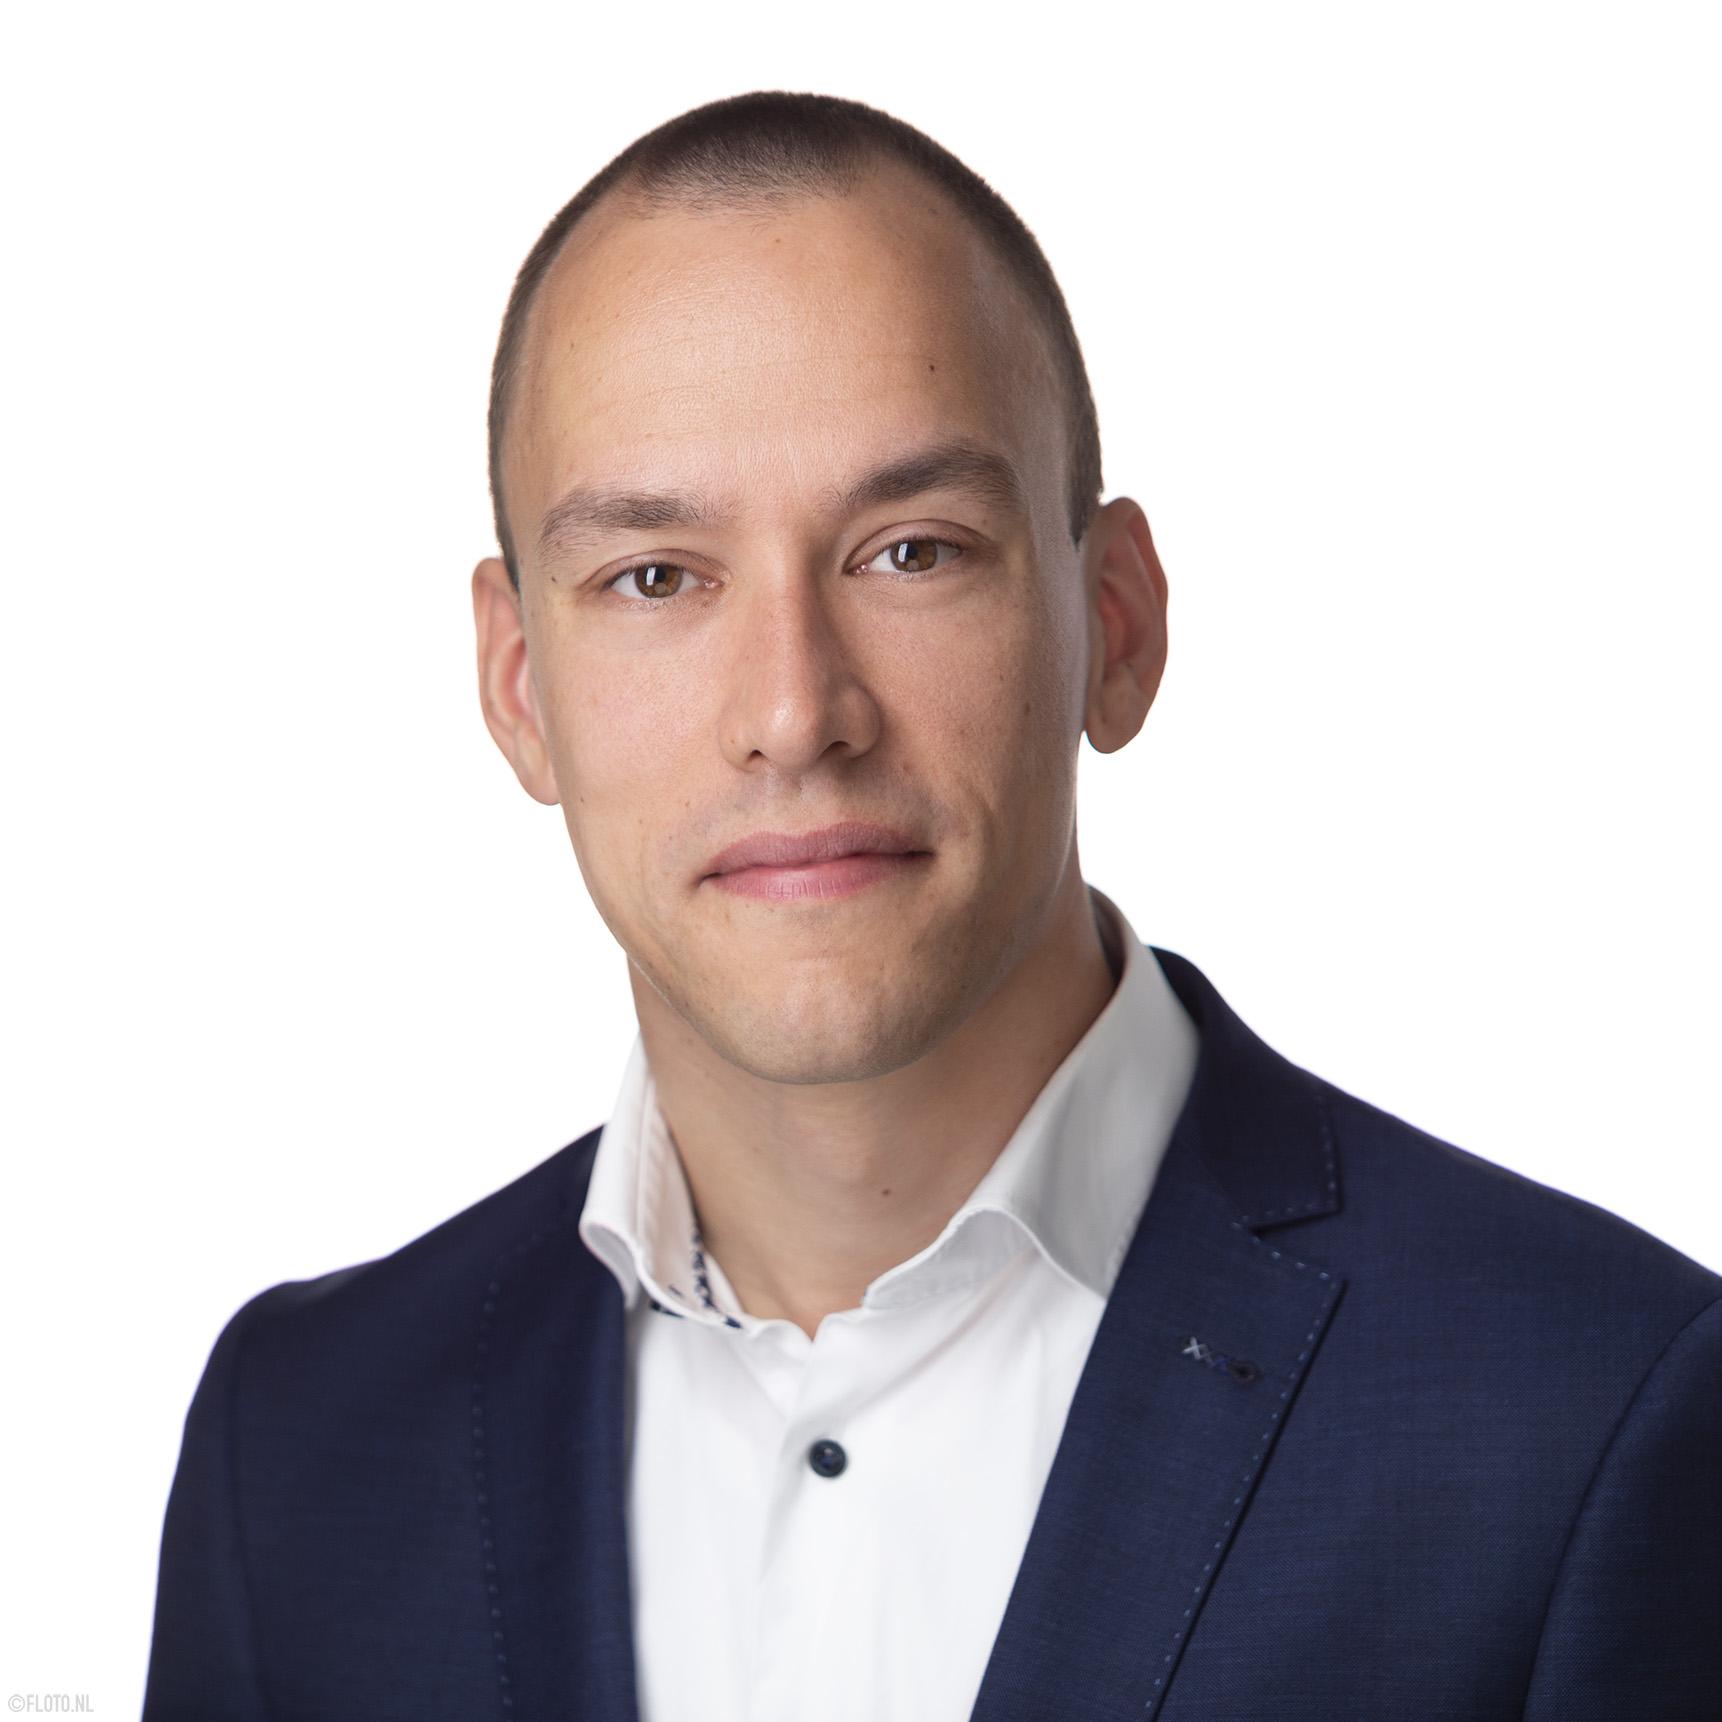 Frank van Vugt van Oterap